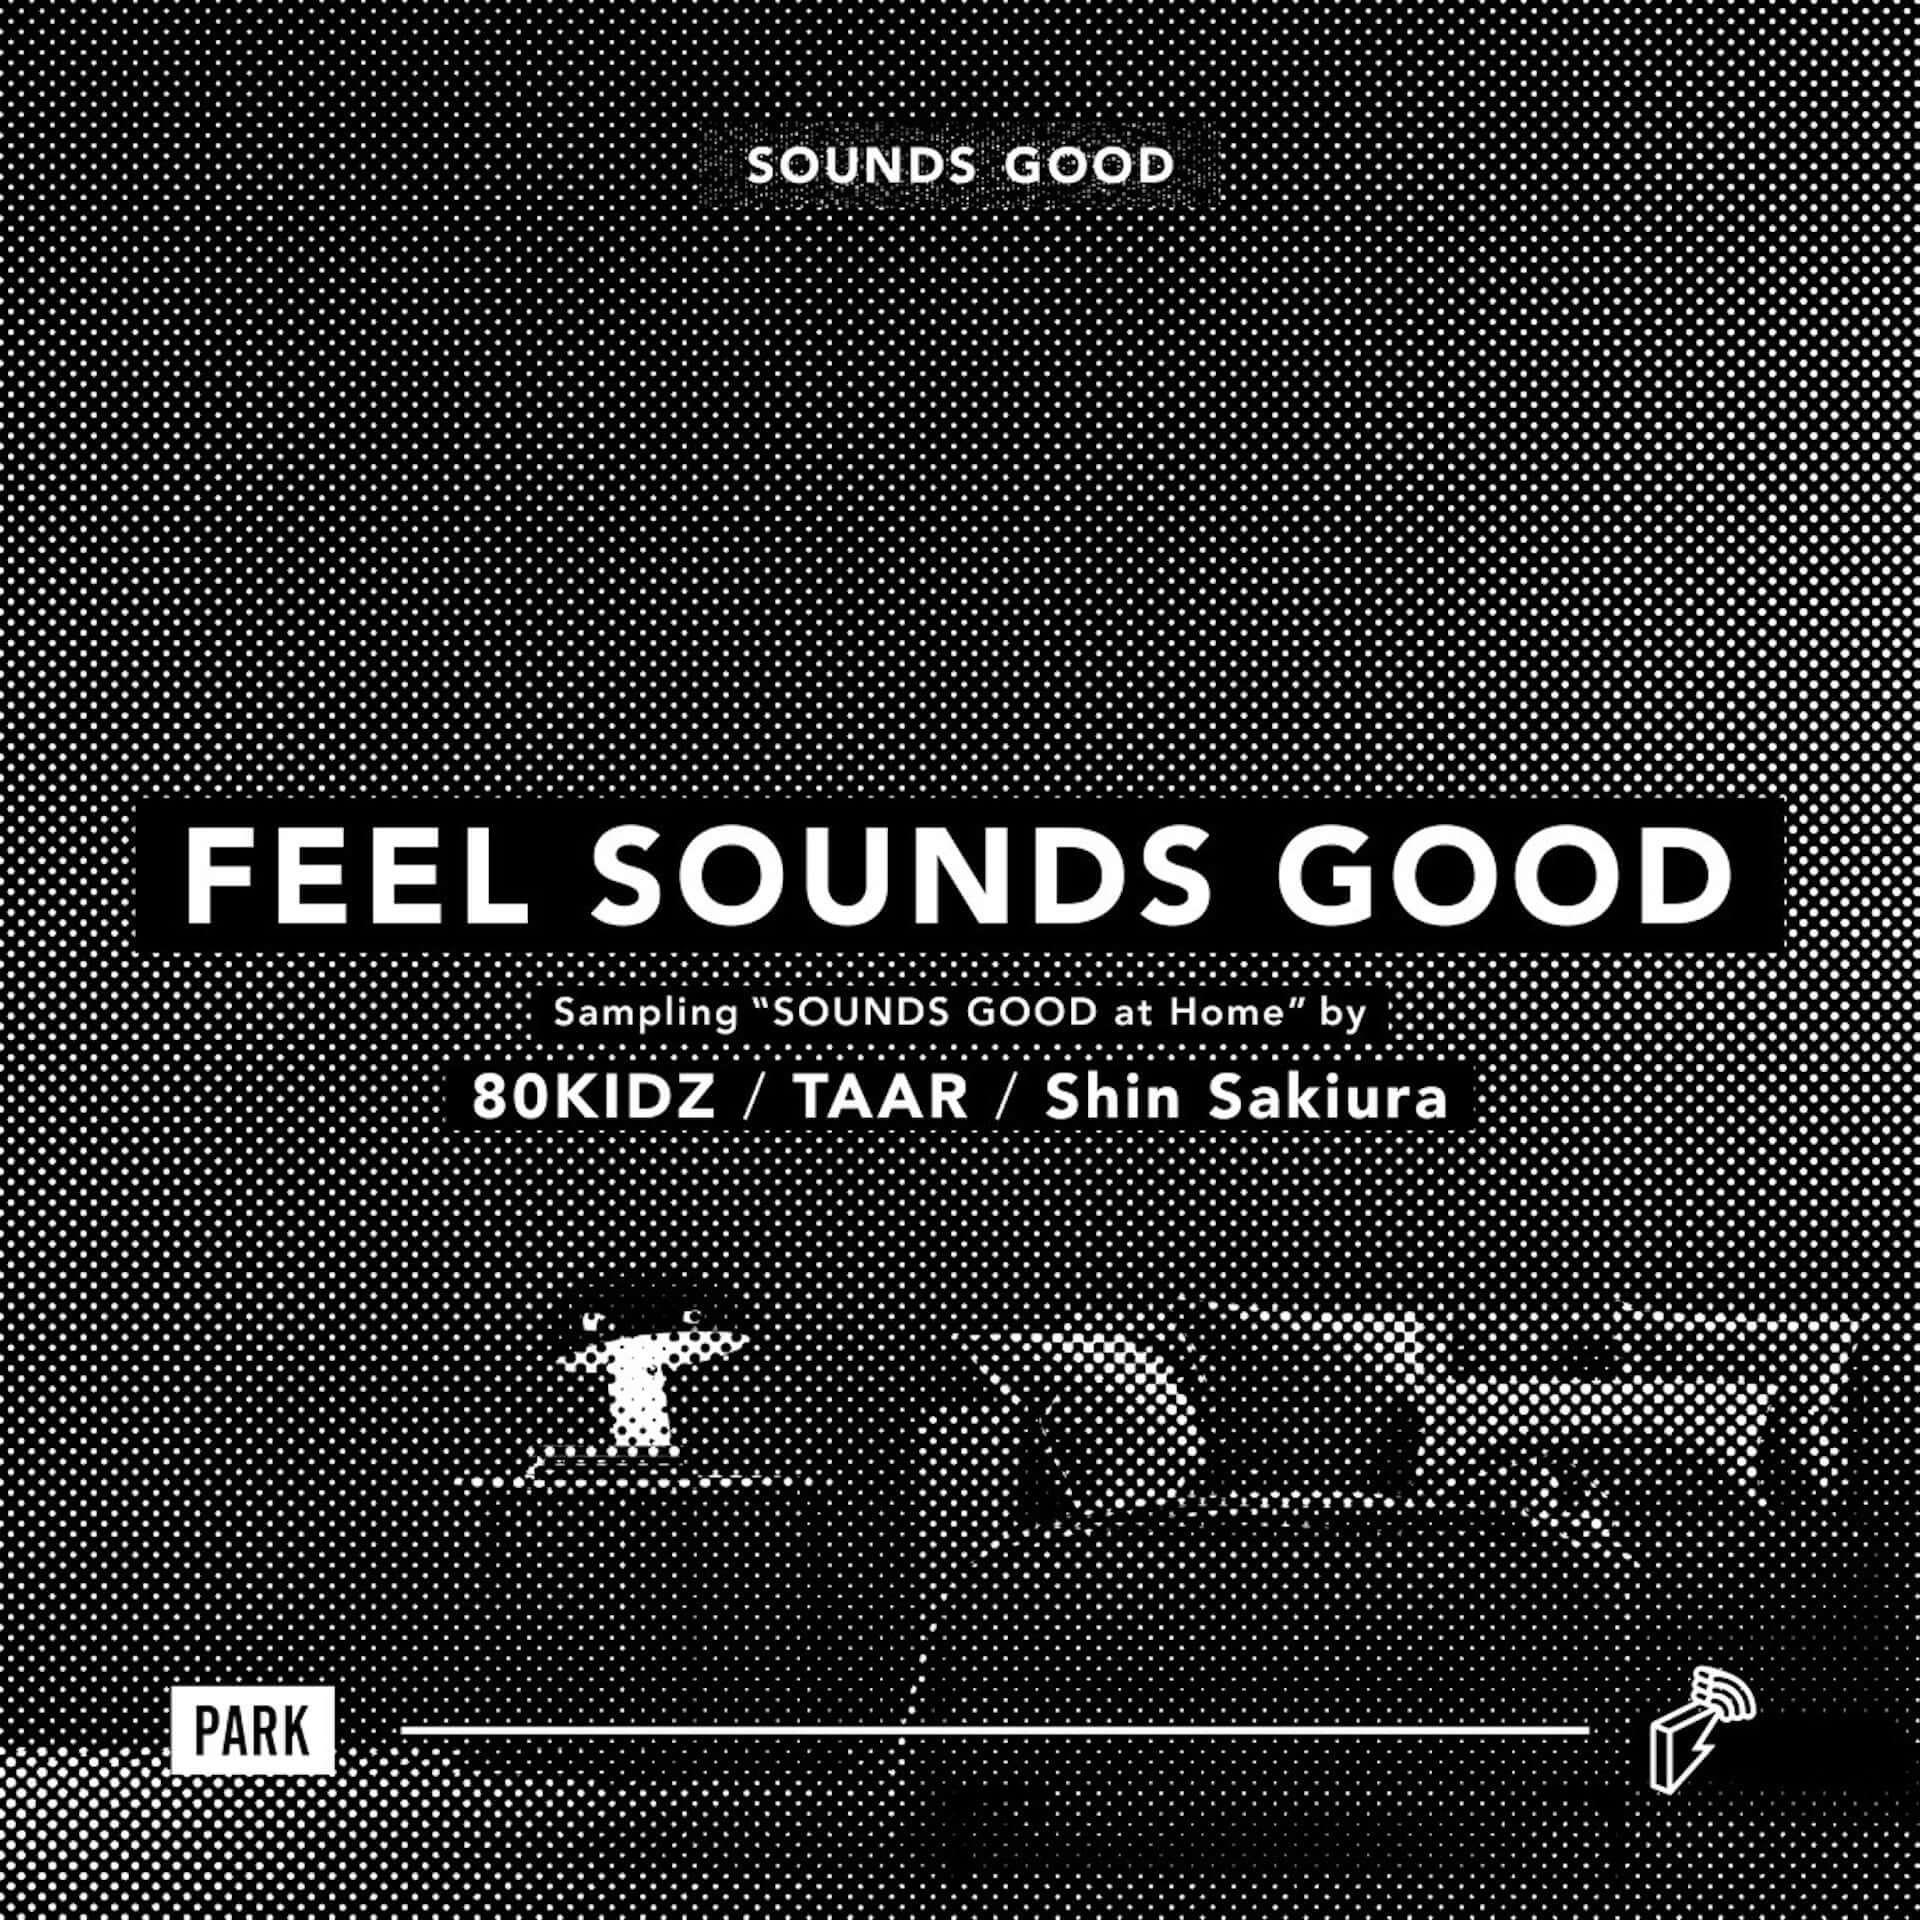 SOUNDS GOOD®とblock.fmによるコンピアルバムがリリース|80KIDZ、TAAR、Shin Sakiuraの楽曲が収録 music200603_feelsoundsgood_7-1920x1920